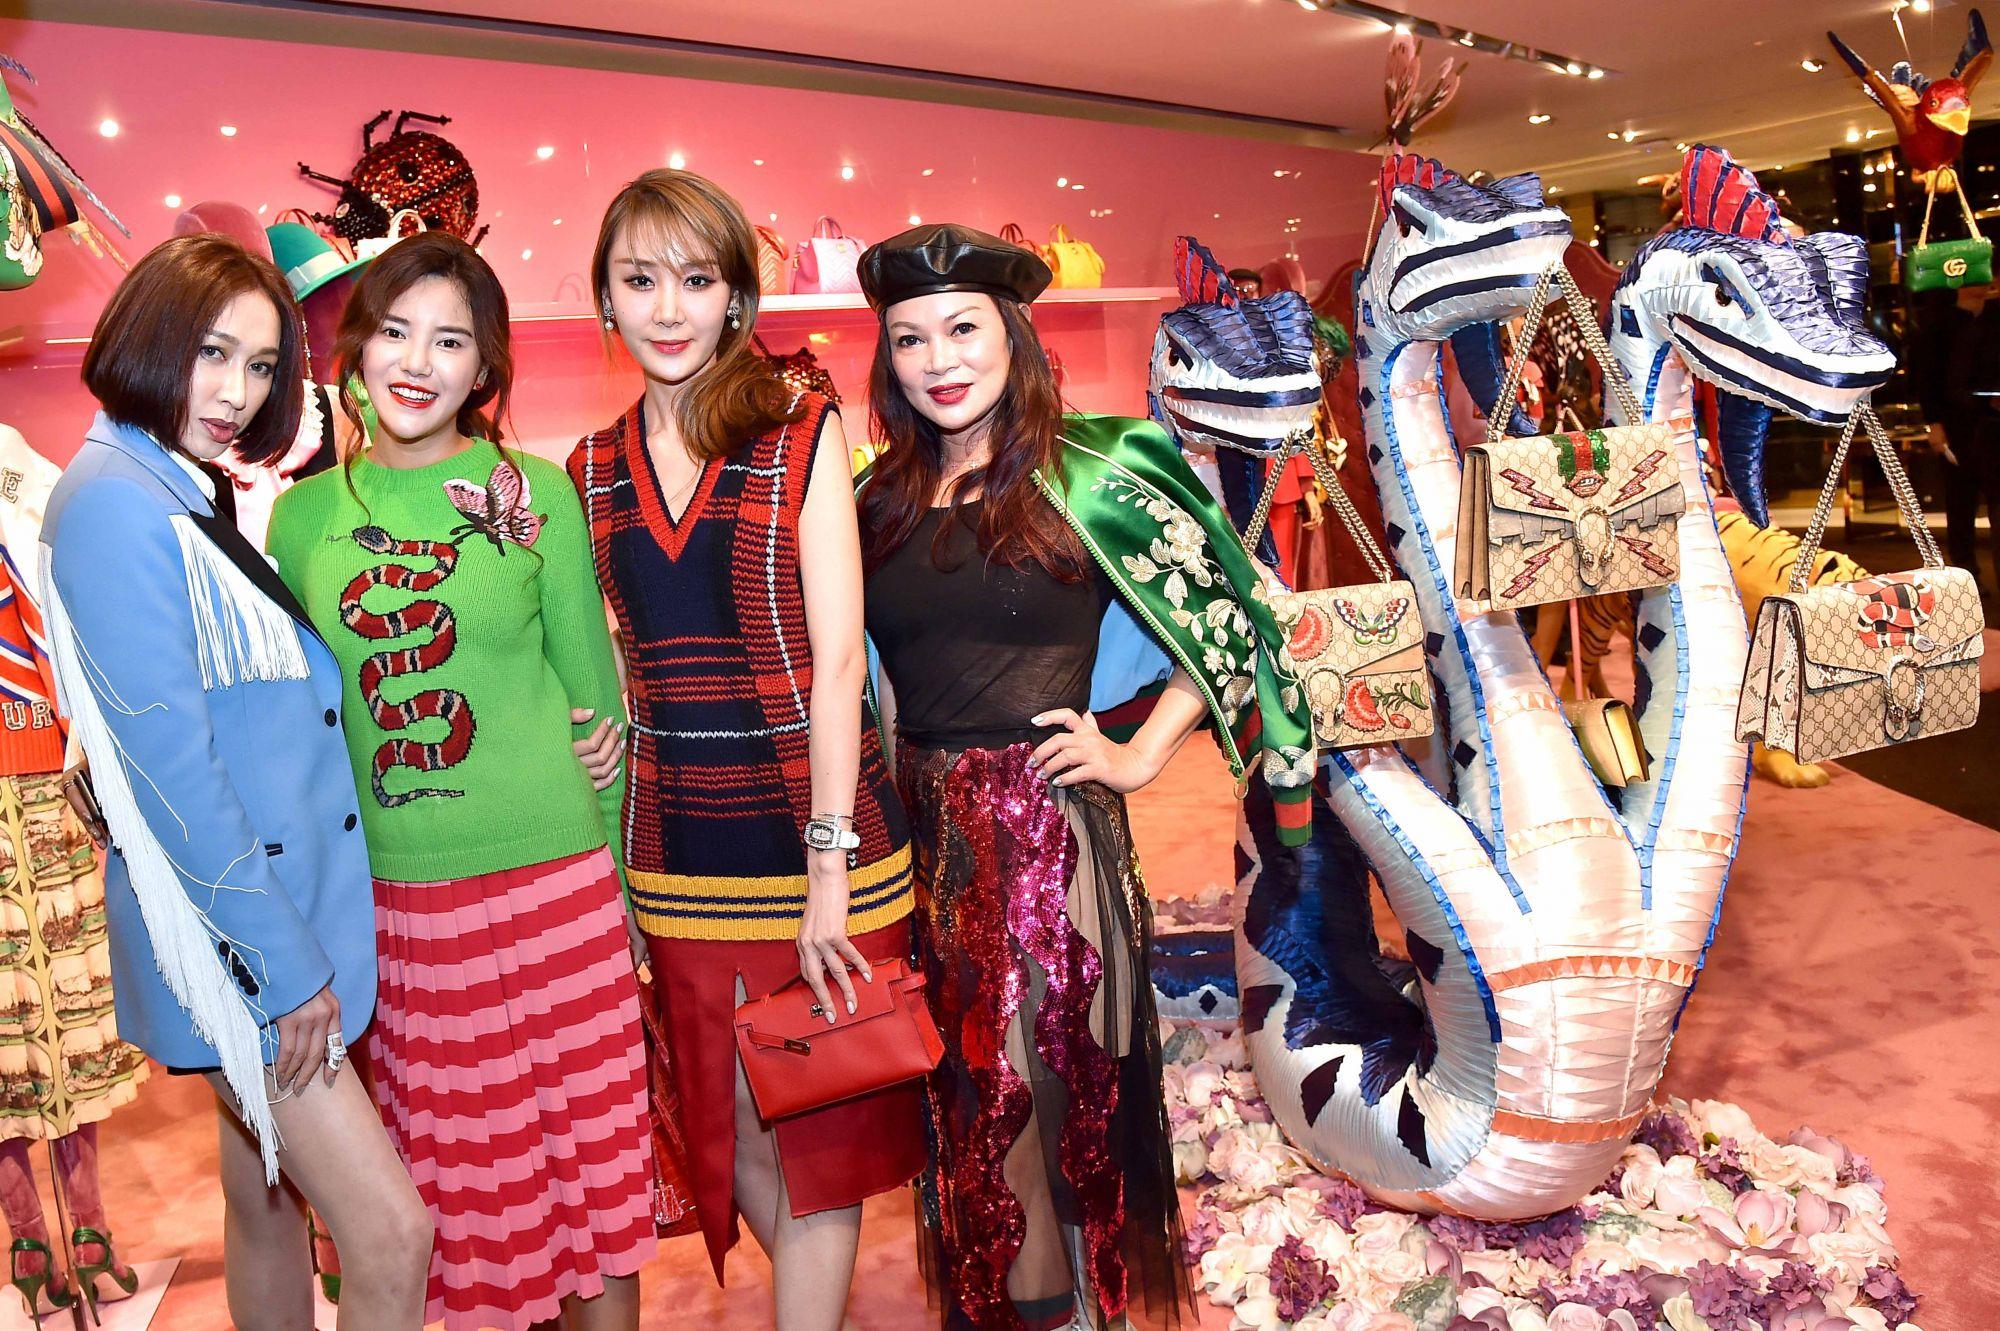 Grace Lau, Talia Wang, guest, Susanna Kang